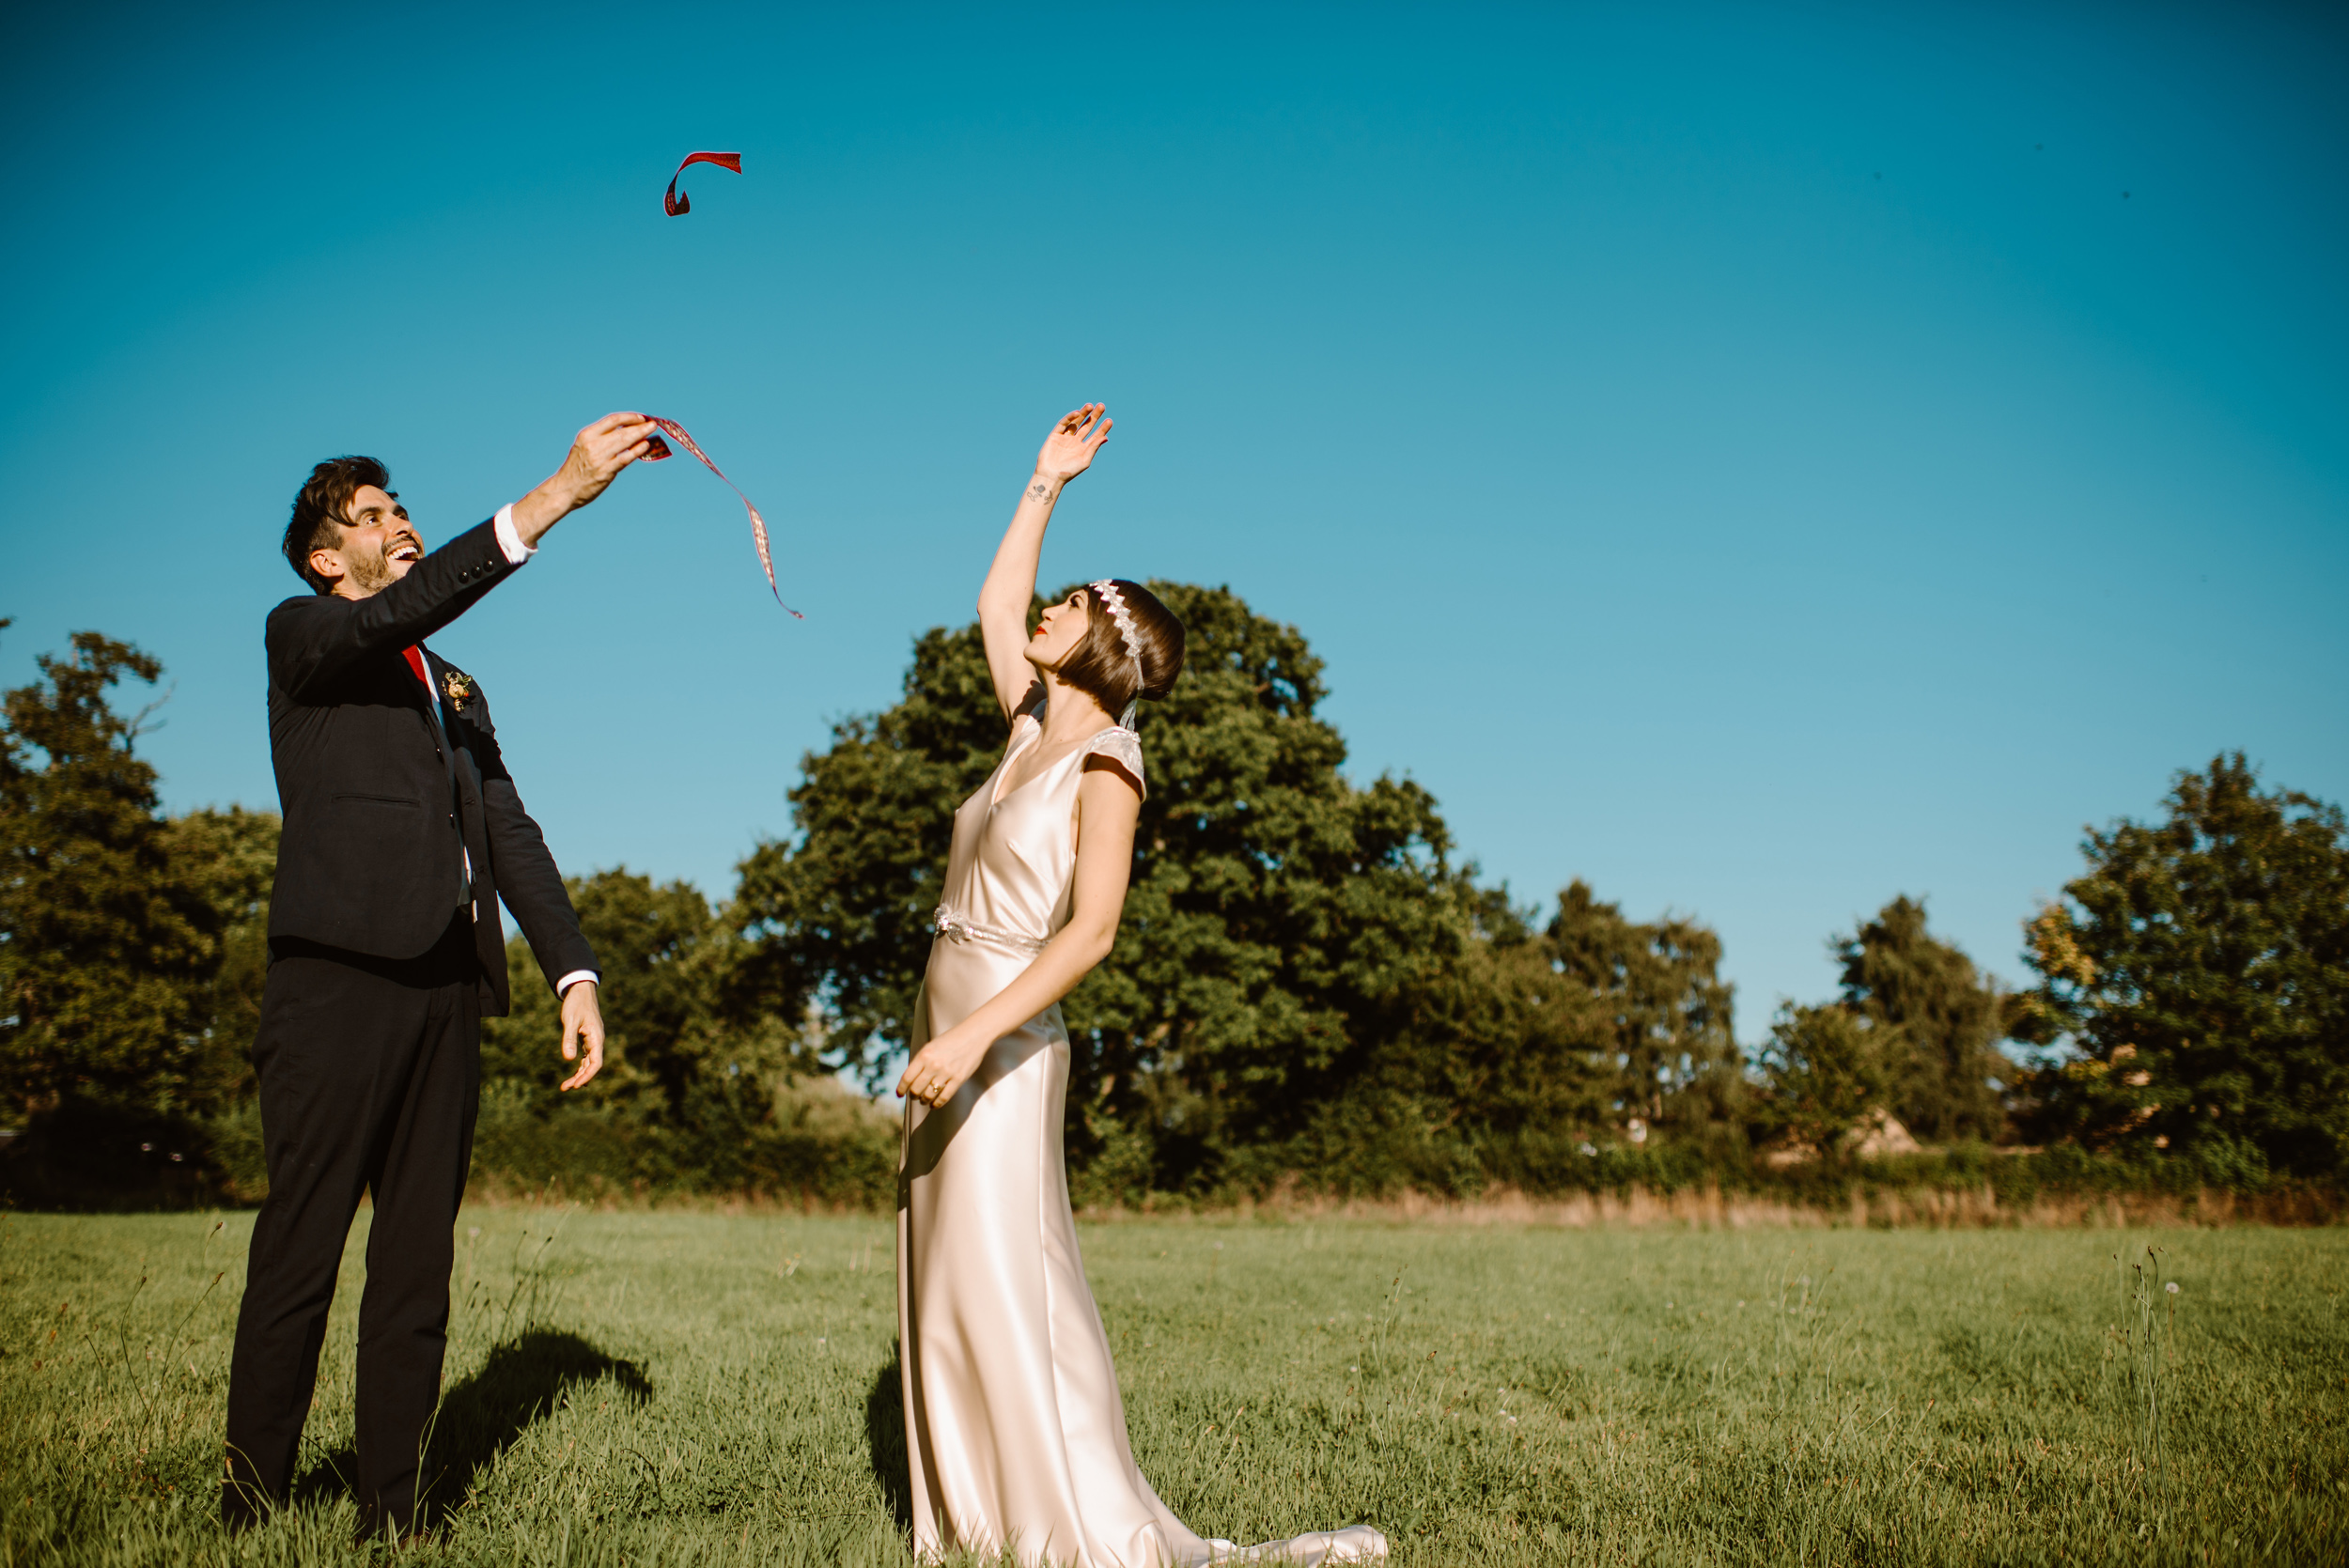 Ro-Kate-Beaumont-bias-cut-silk-wedding-gown-back-garden-wedding-by-Ellie-Gillard-20.jpg